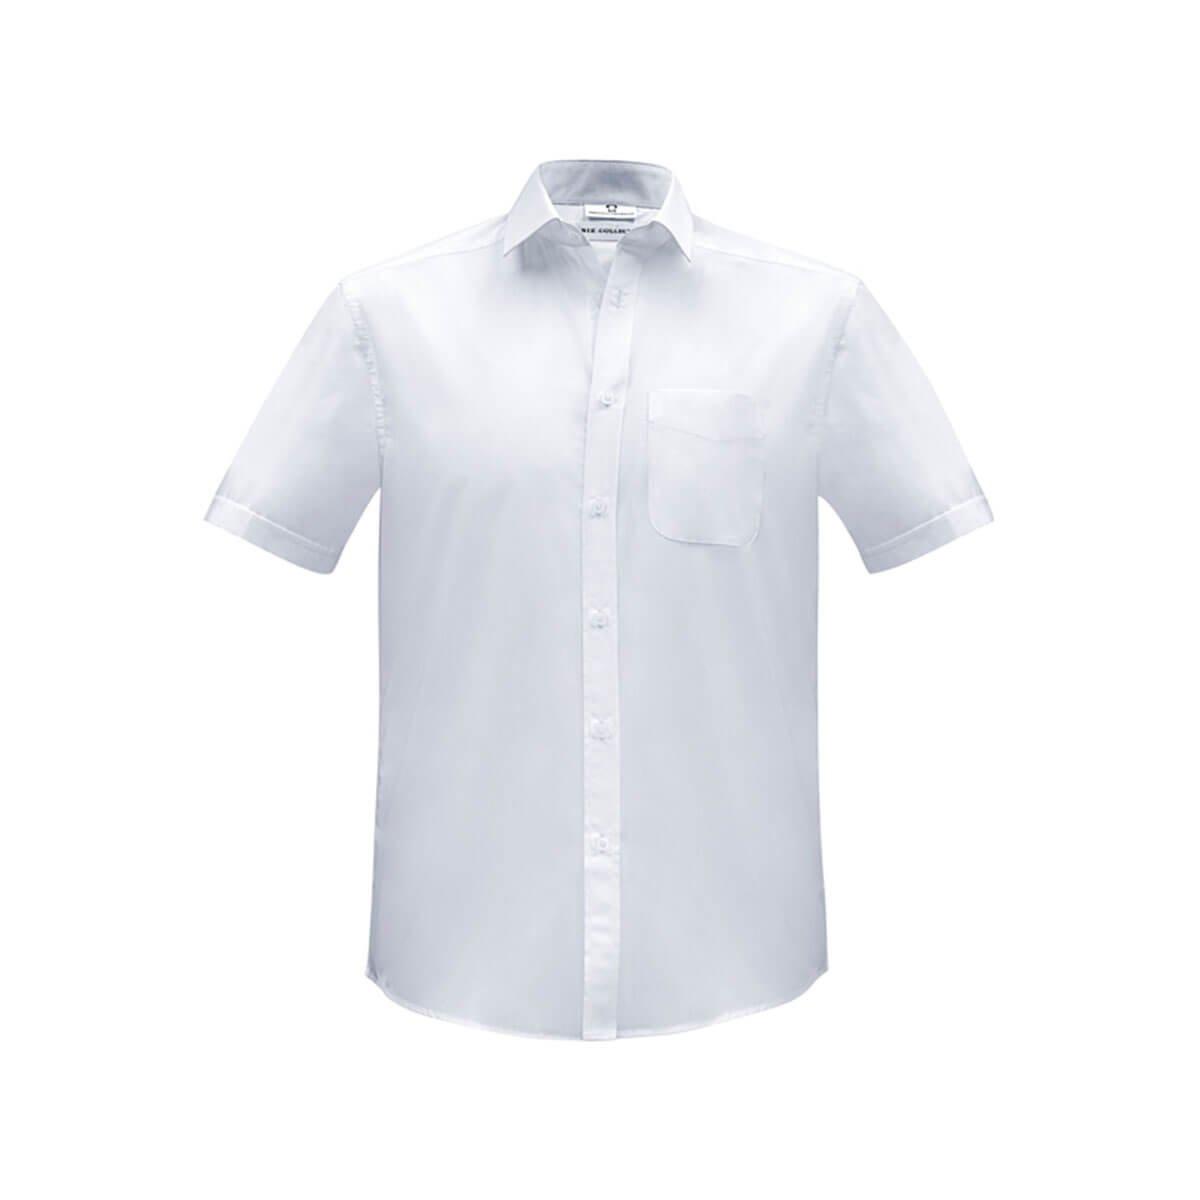 Mens Euro Short Sleeve Shirt-White